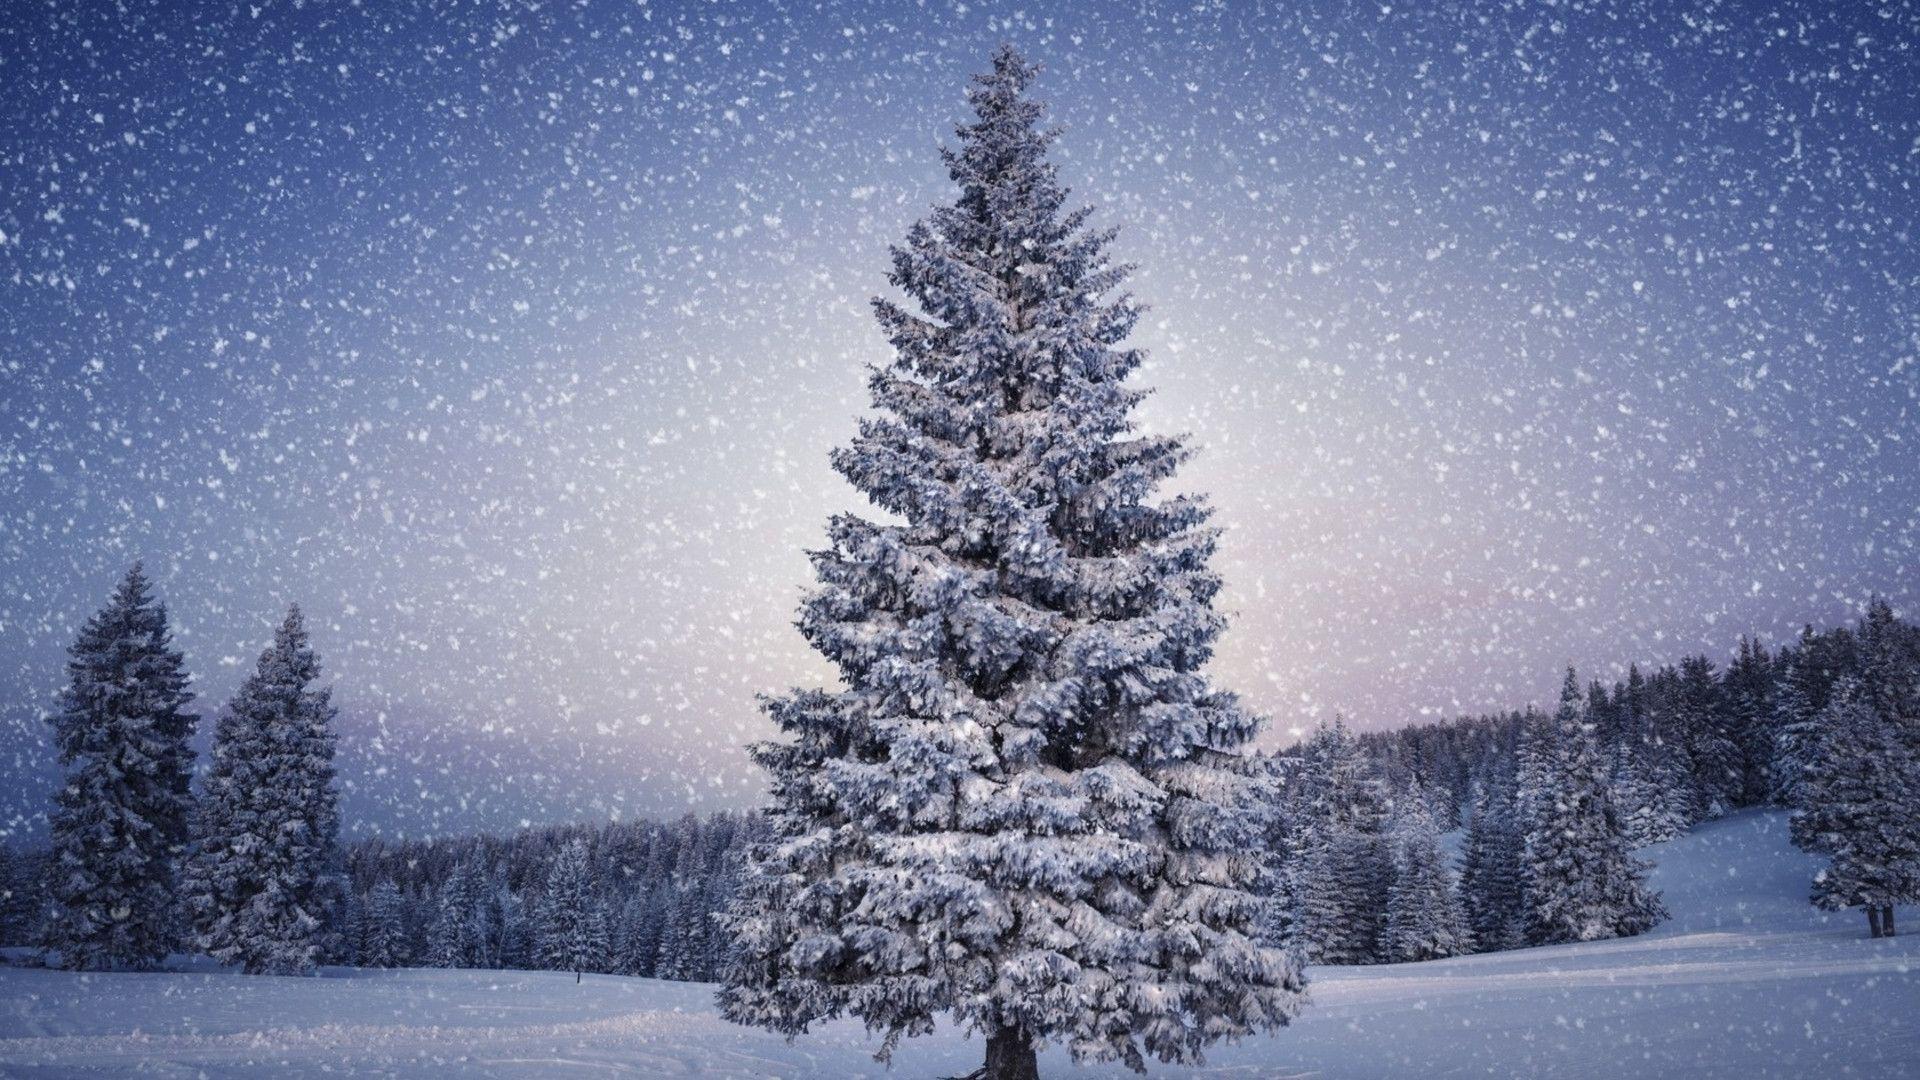 christmas wallpaper mac retina – merry christmas and happy new year 2018